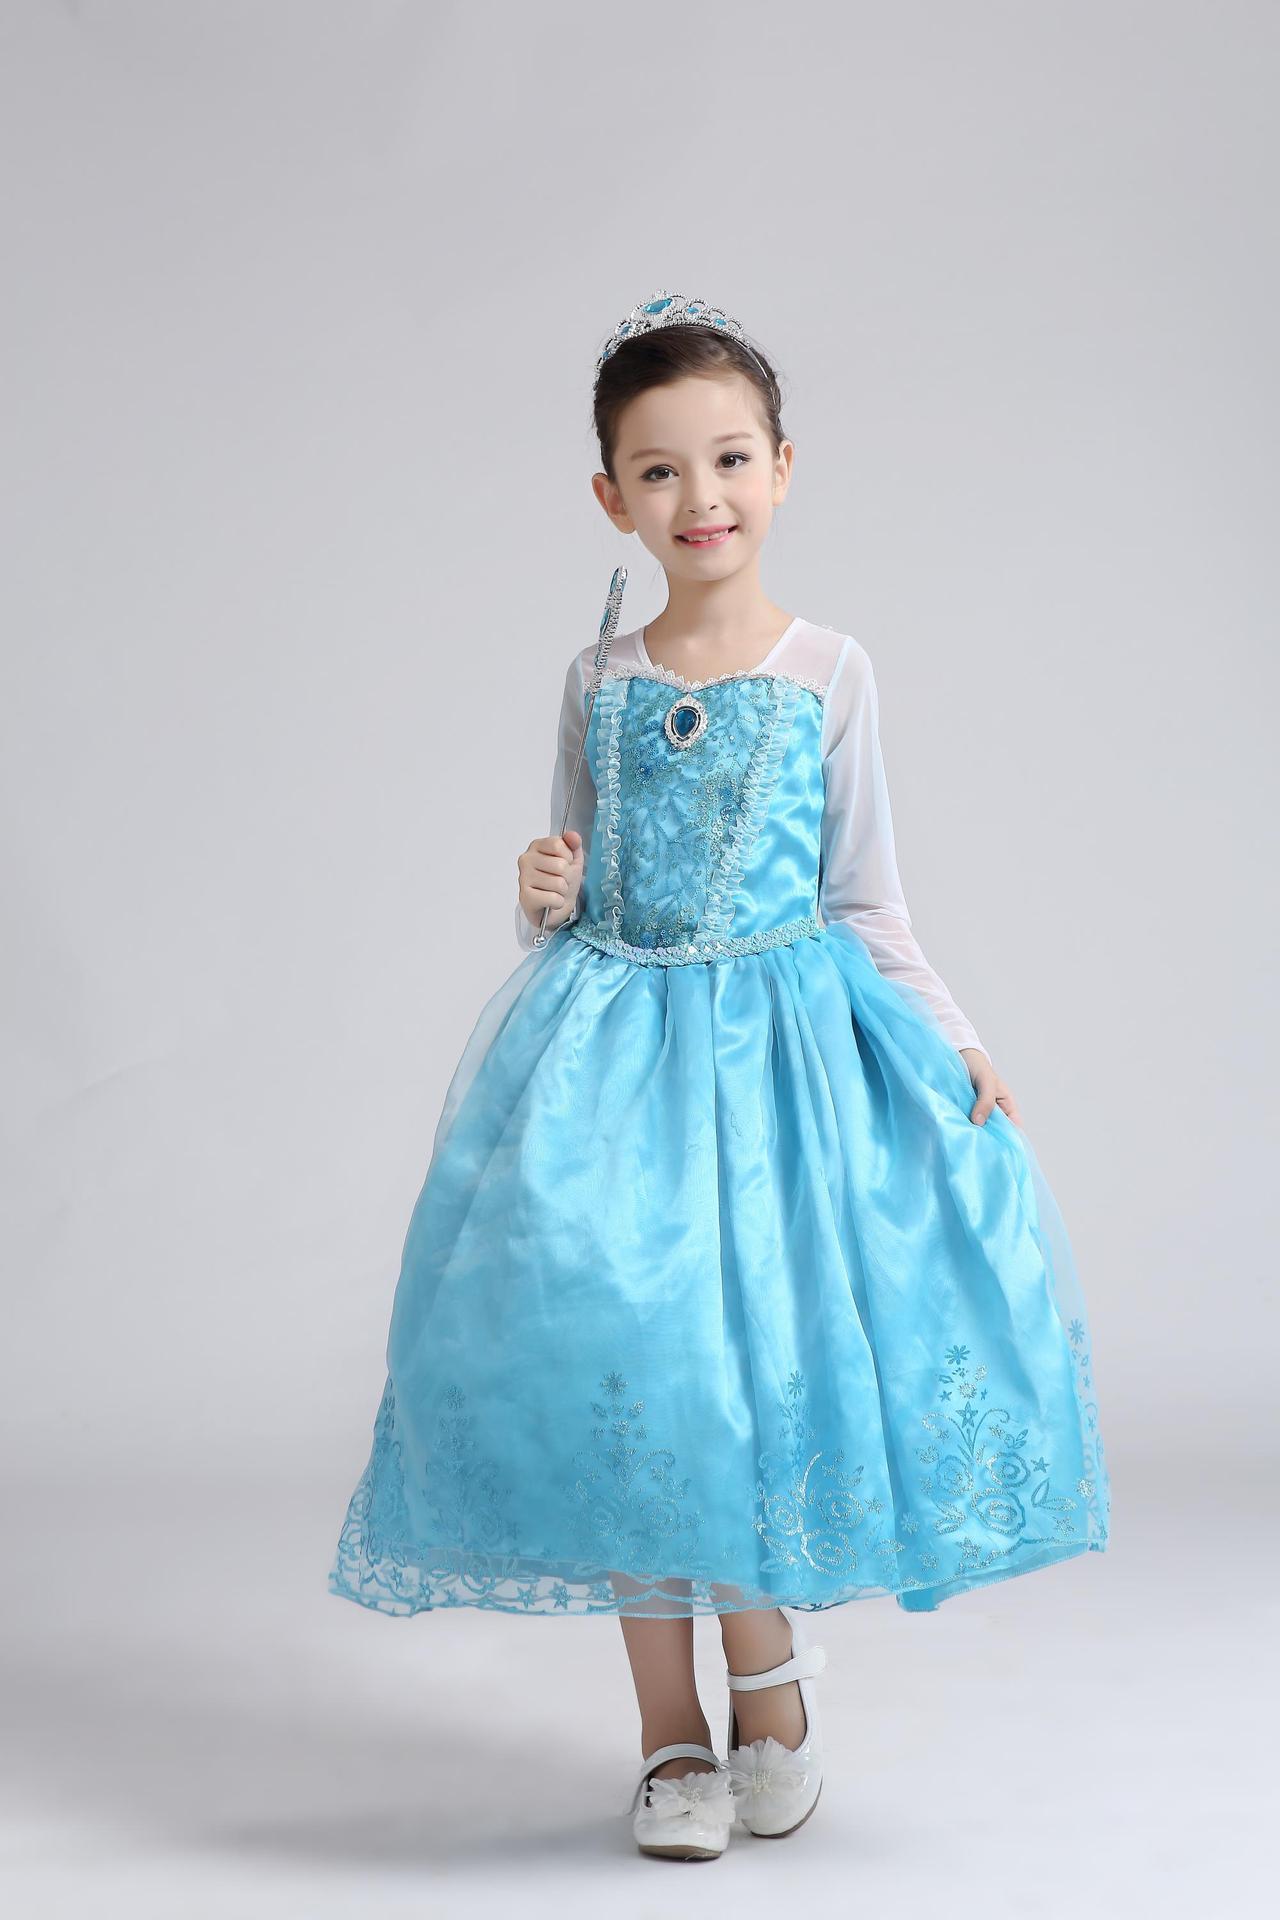 2018 New Arrival Costume Dress Girls Sequin Princess Long Sleeve ...